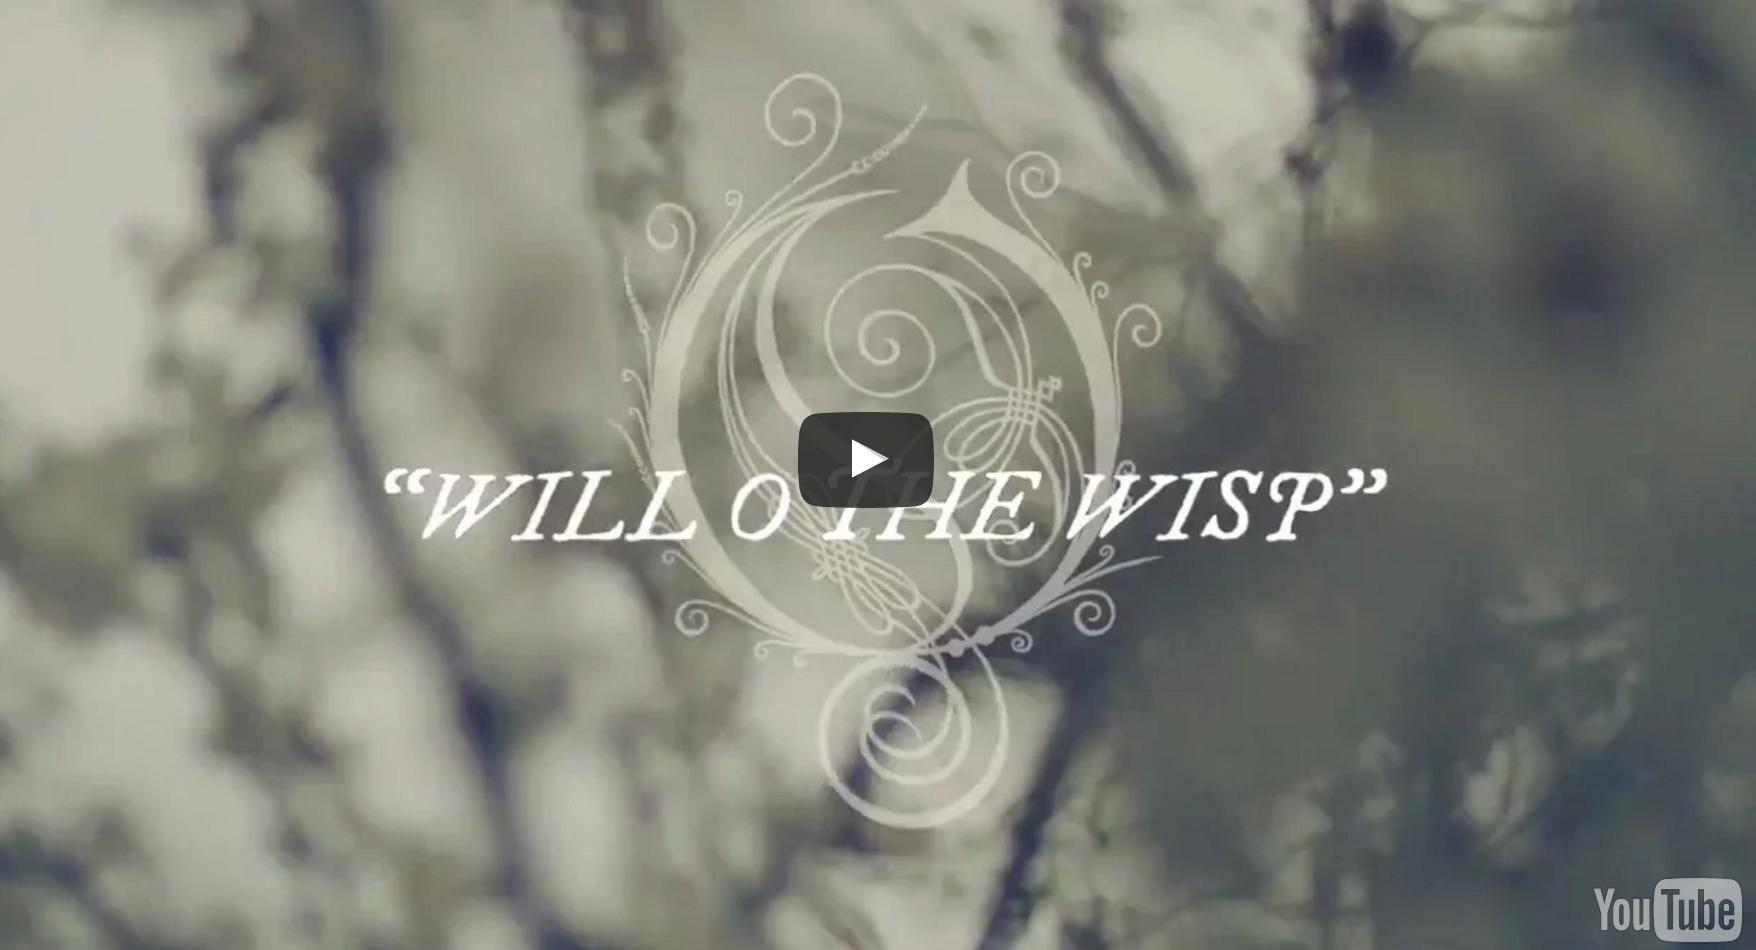 Opeth – Will O The Wisp (Lyric Video)